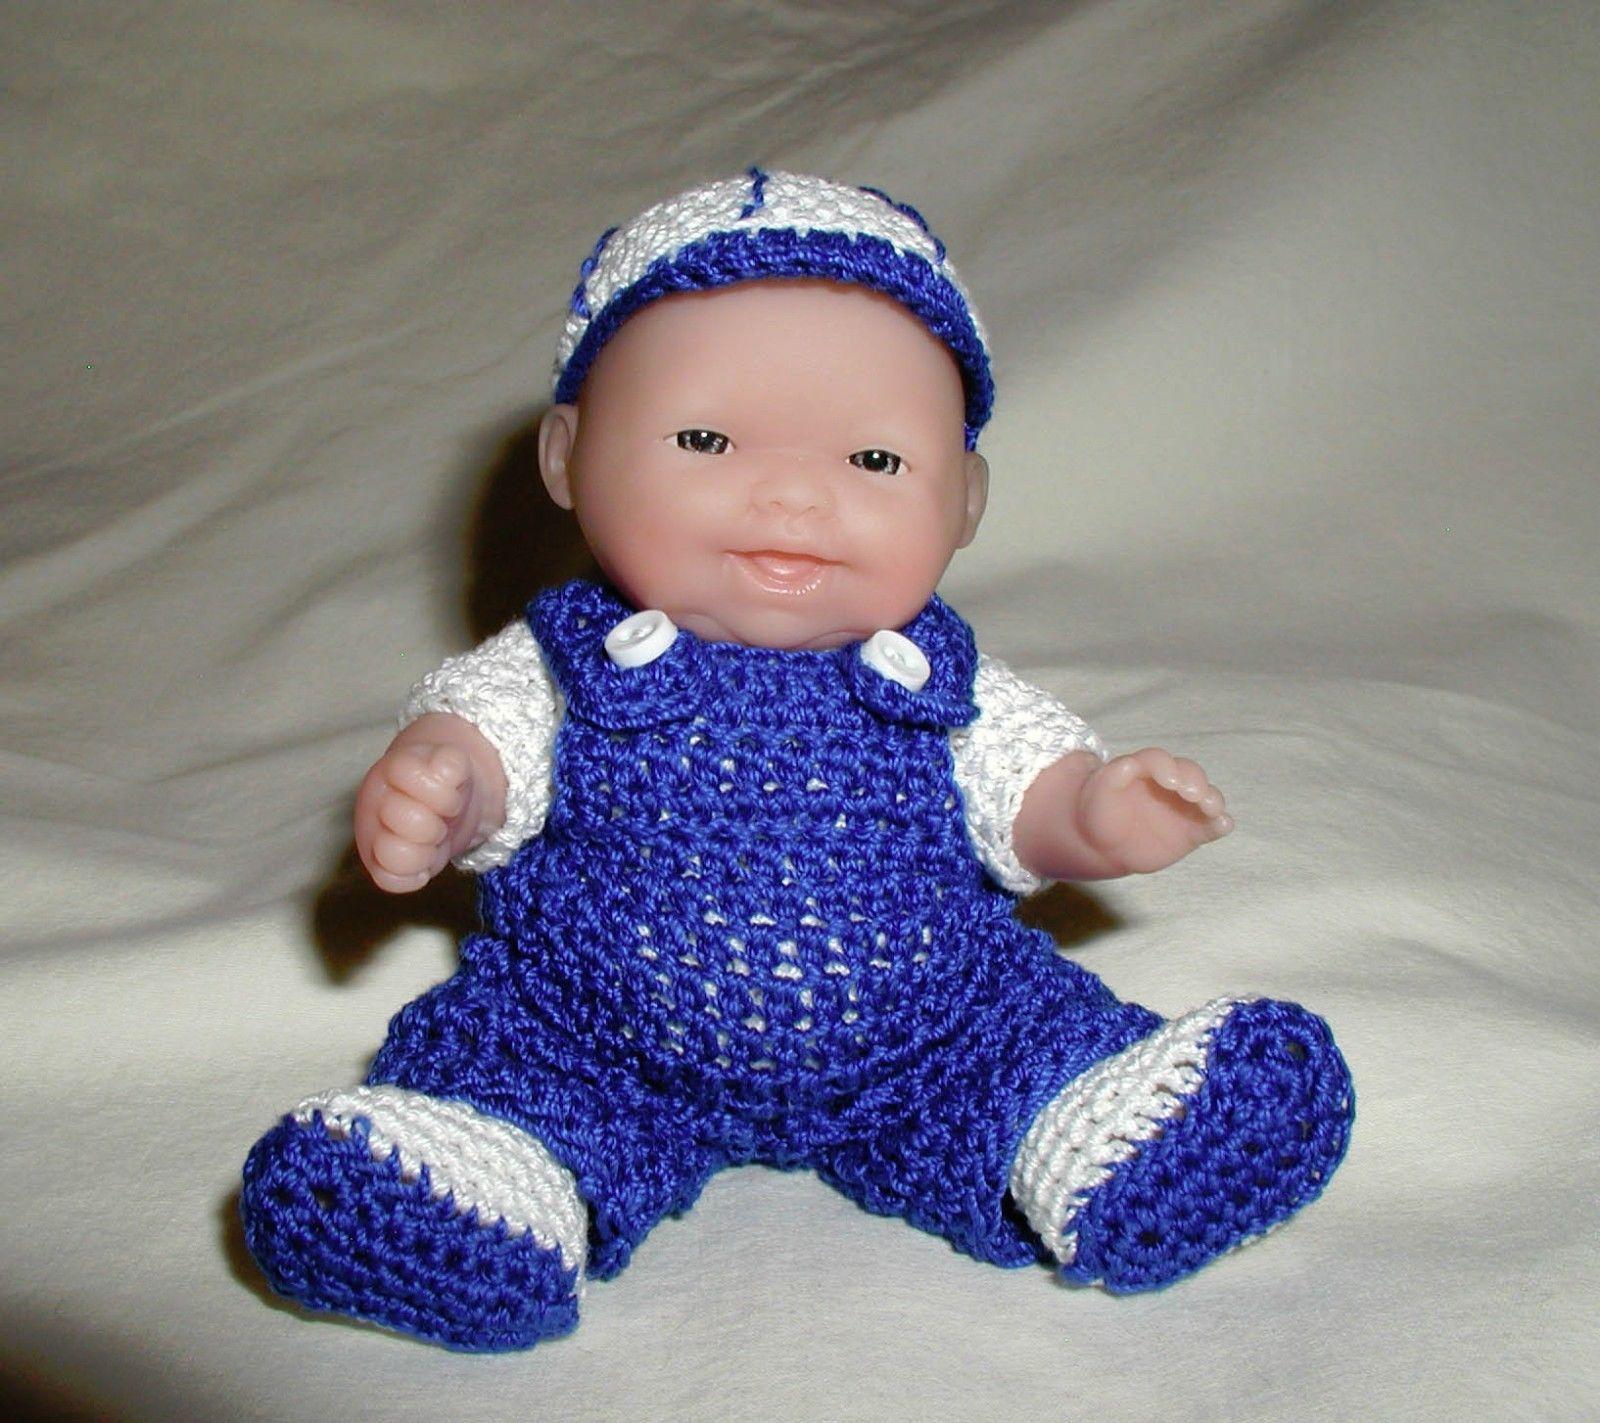 "Baseball Itty Bitty Baby Boy 5"" Lots of Love Babies eBay"